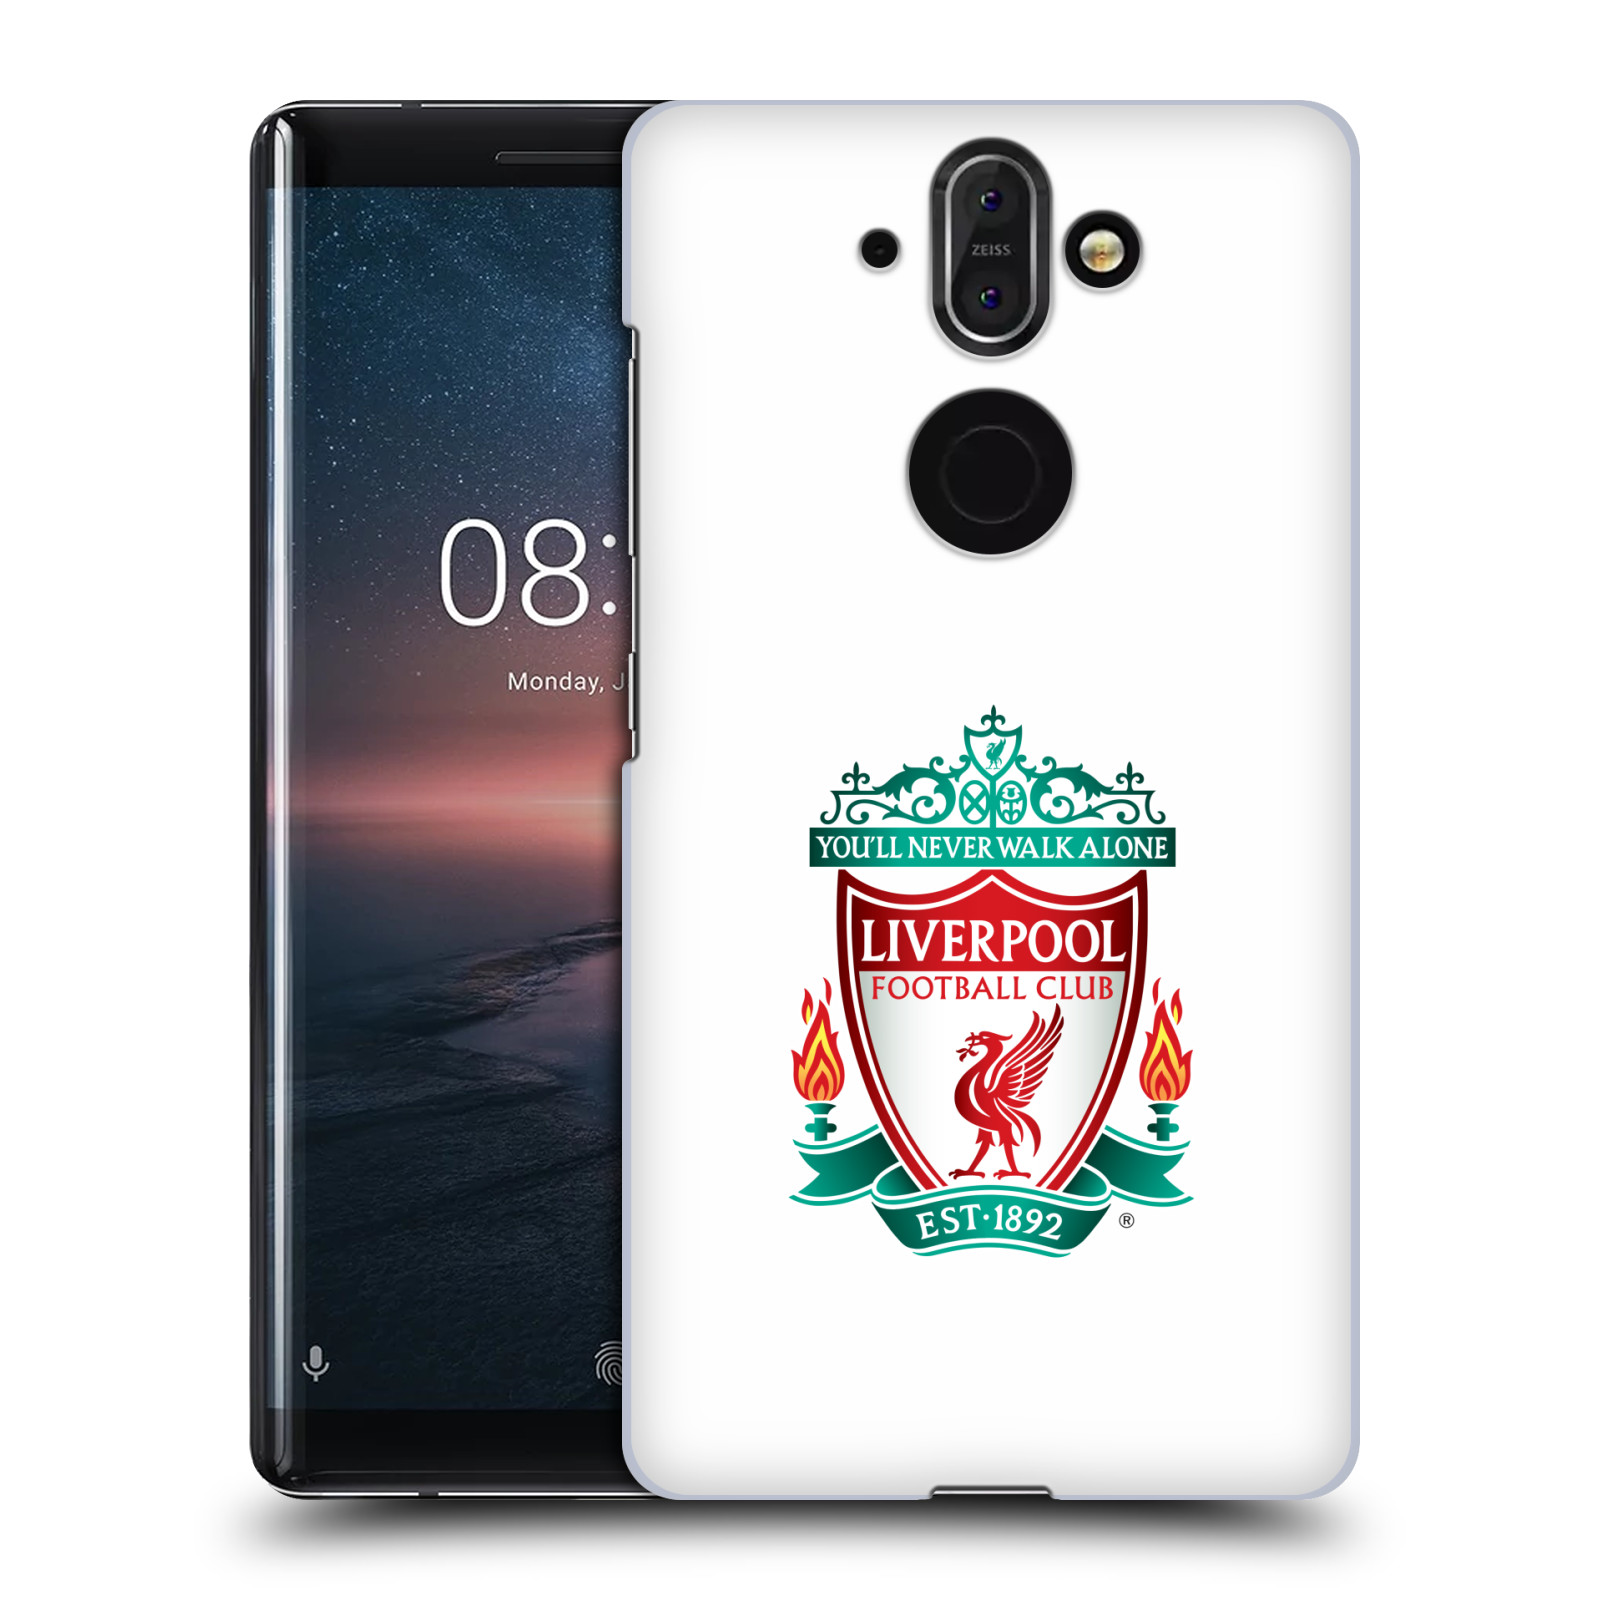 Plastové pouzdro na mobil Nokia 8 Sirocco - Head Case - ZNAK LIVERPOOL FC OFFICIAL WHITE